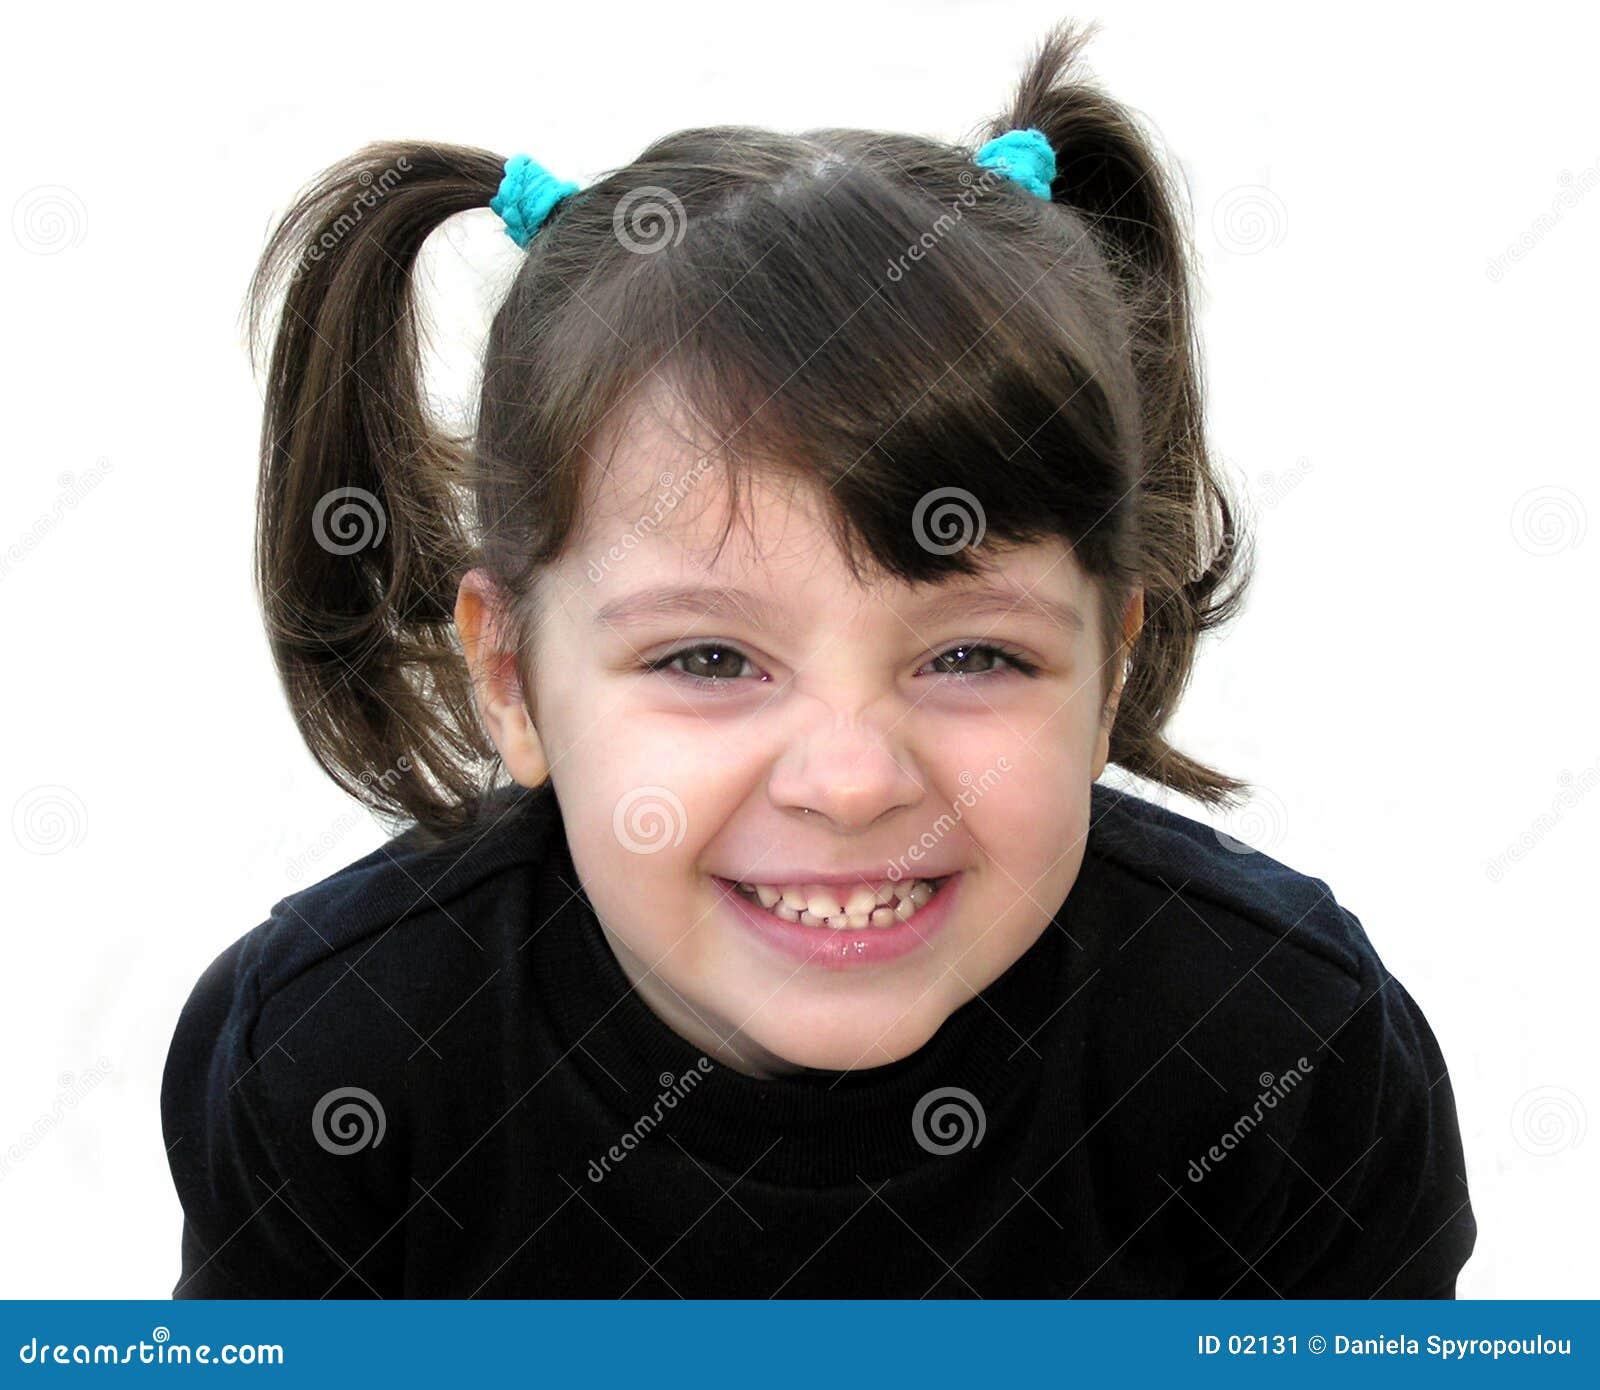 Download 女孩微笑的一点 库存图片. 图片 包括有 微笑, 天使, 眼睛, 愉快, 婴孩, 快乐, 无罪, 孩子, 传神, beautifuler - 2131